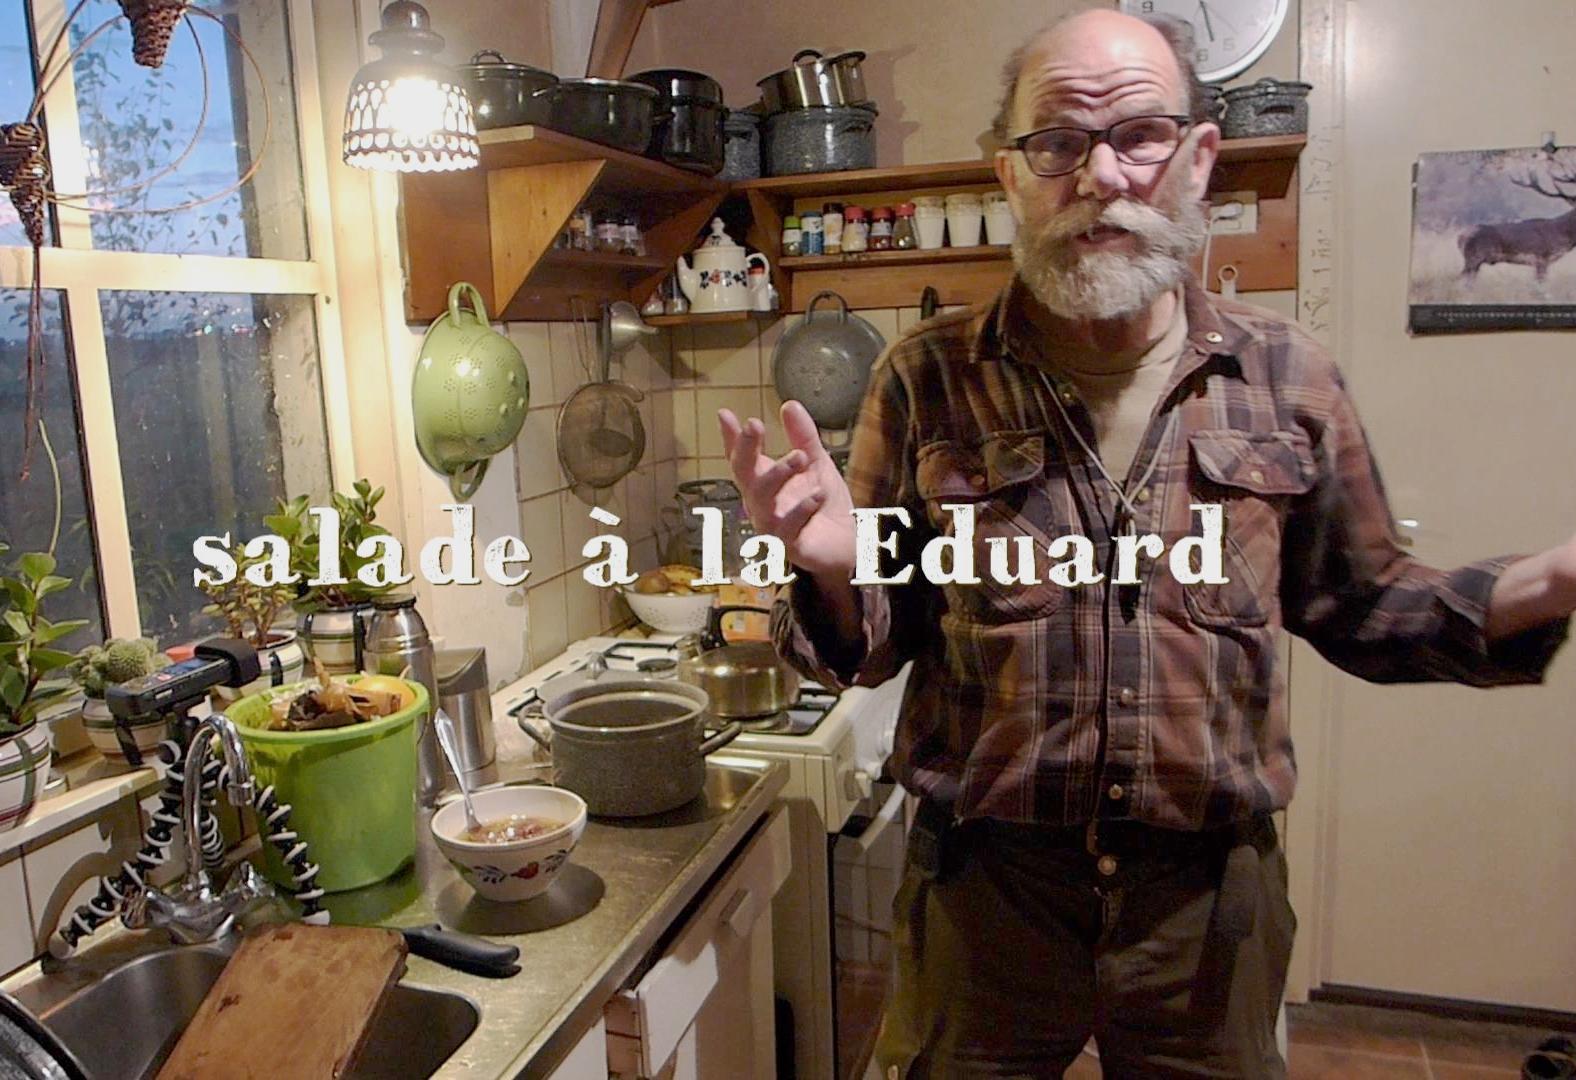 Eduard van Adrichem foraged salad